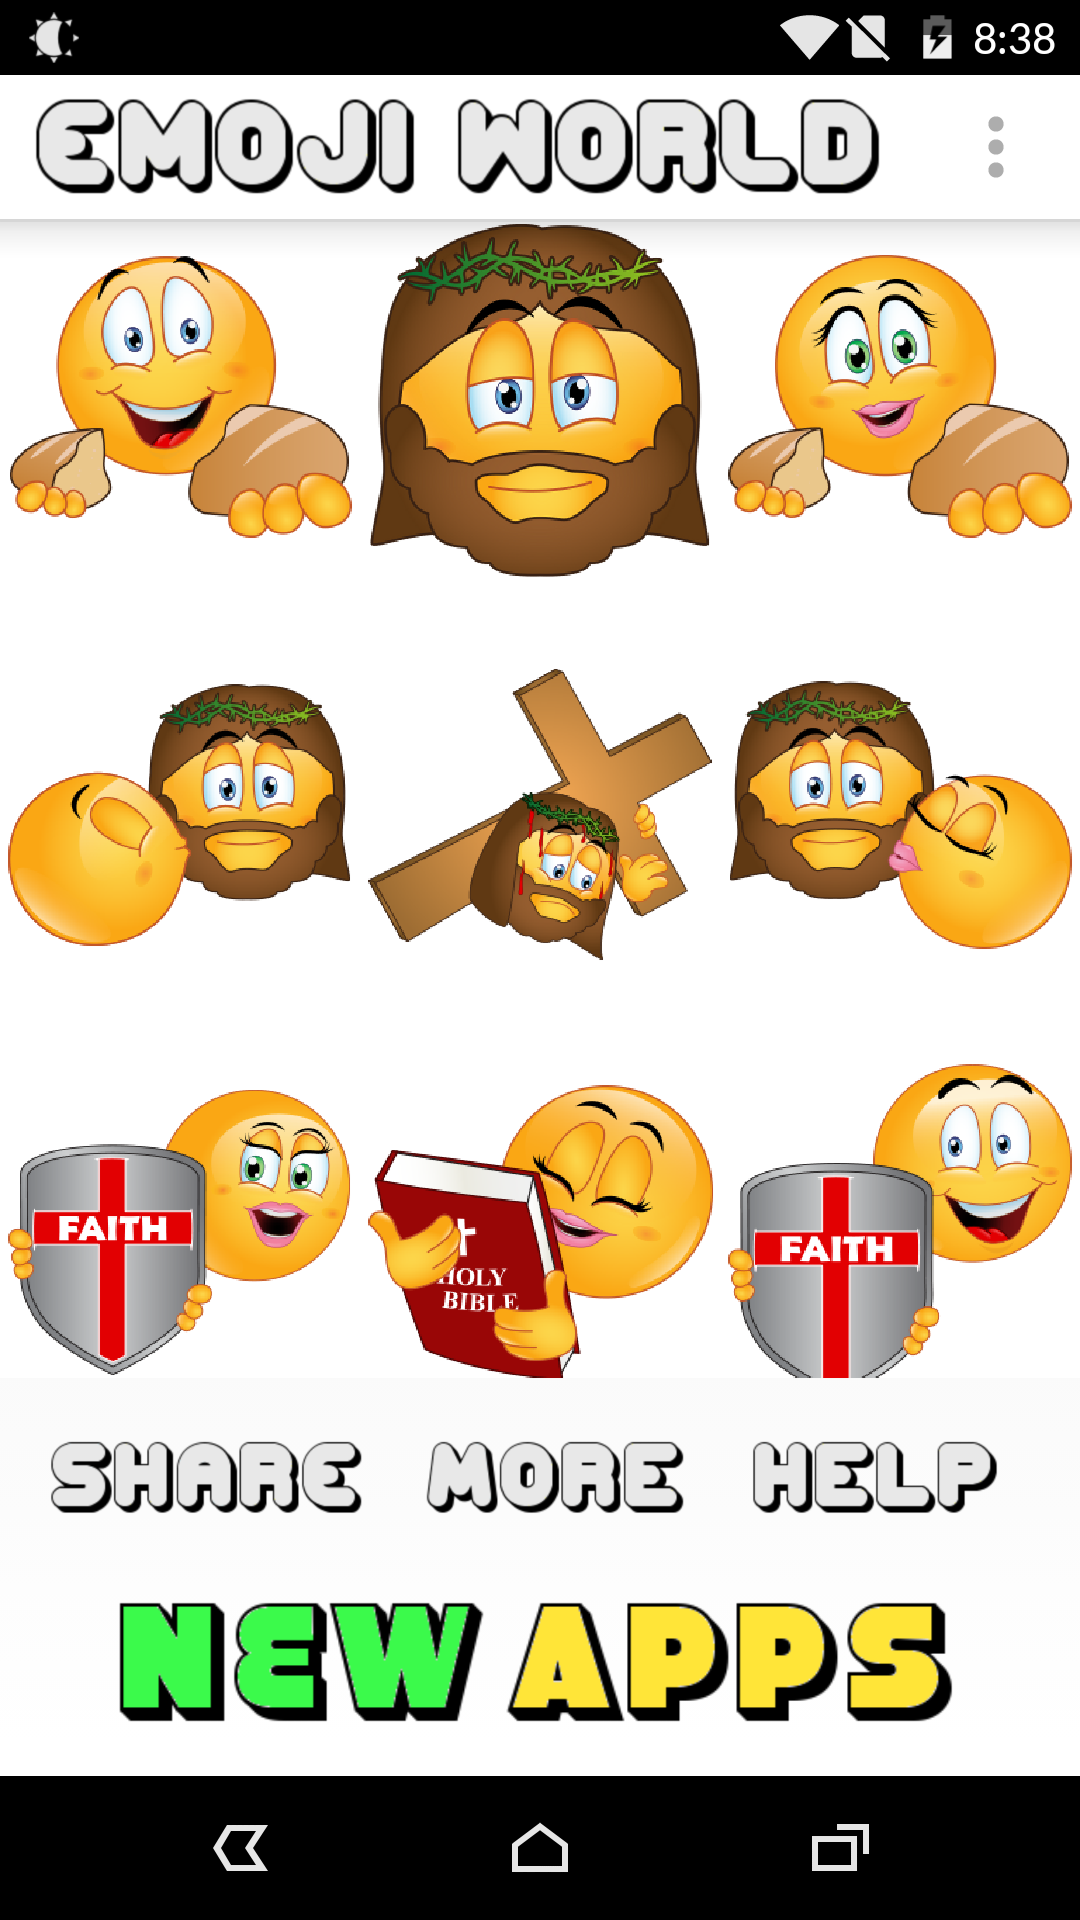 amazon com  christian emojis 2 by emoji world  appstore